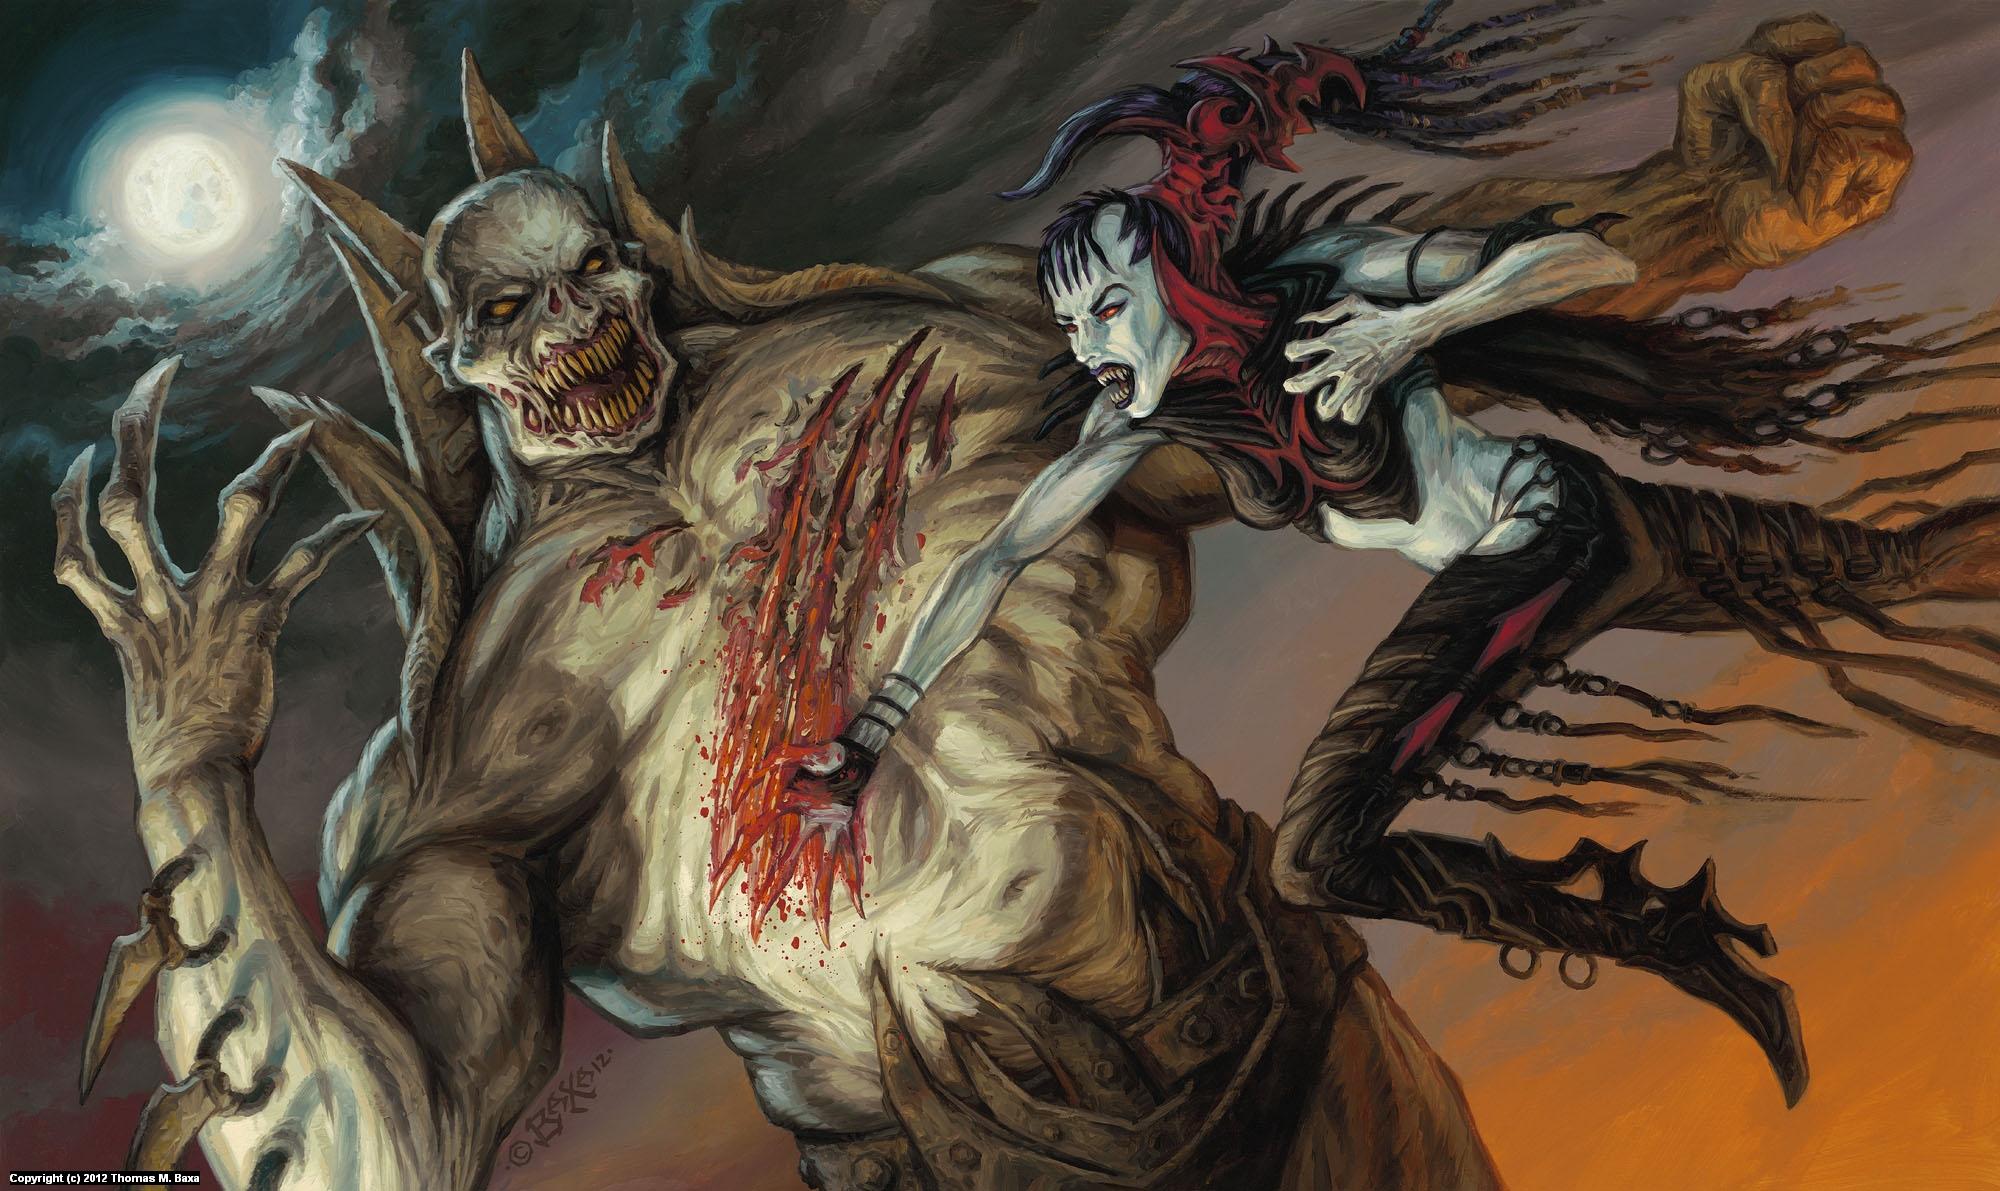 Nosferatu vs. Zombie Lord Artwork by Thomas Baxa